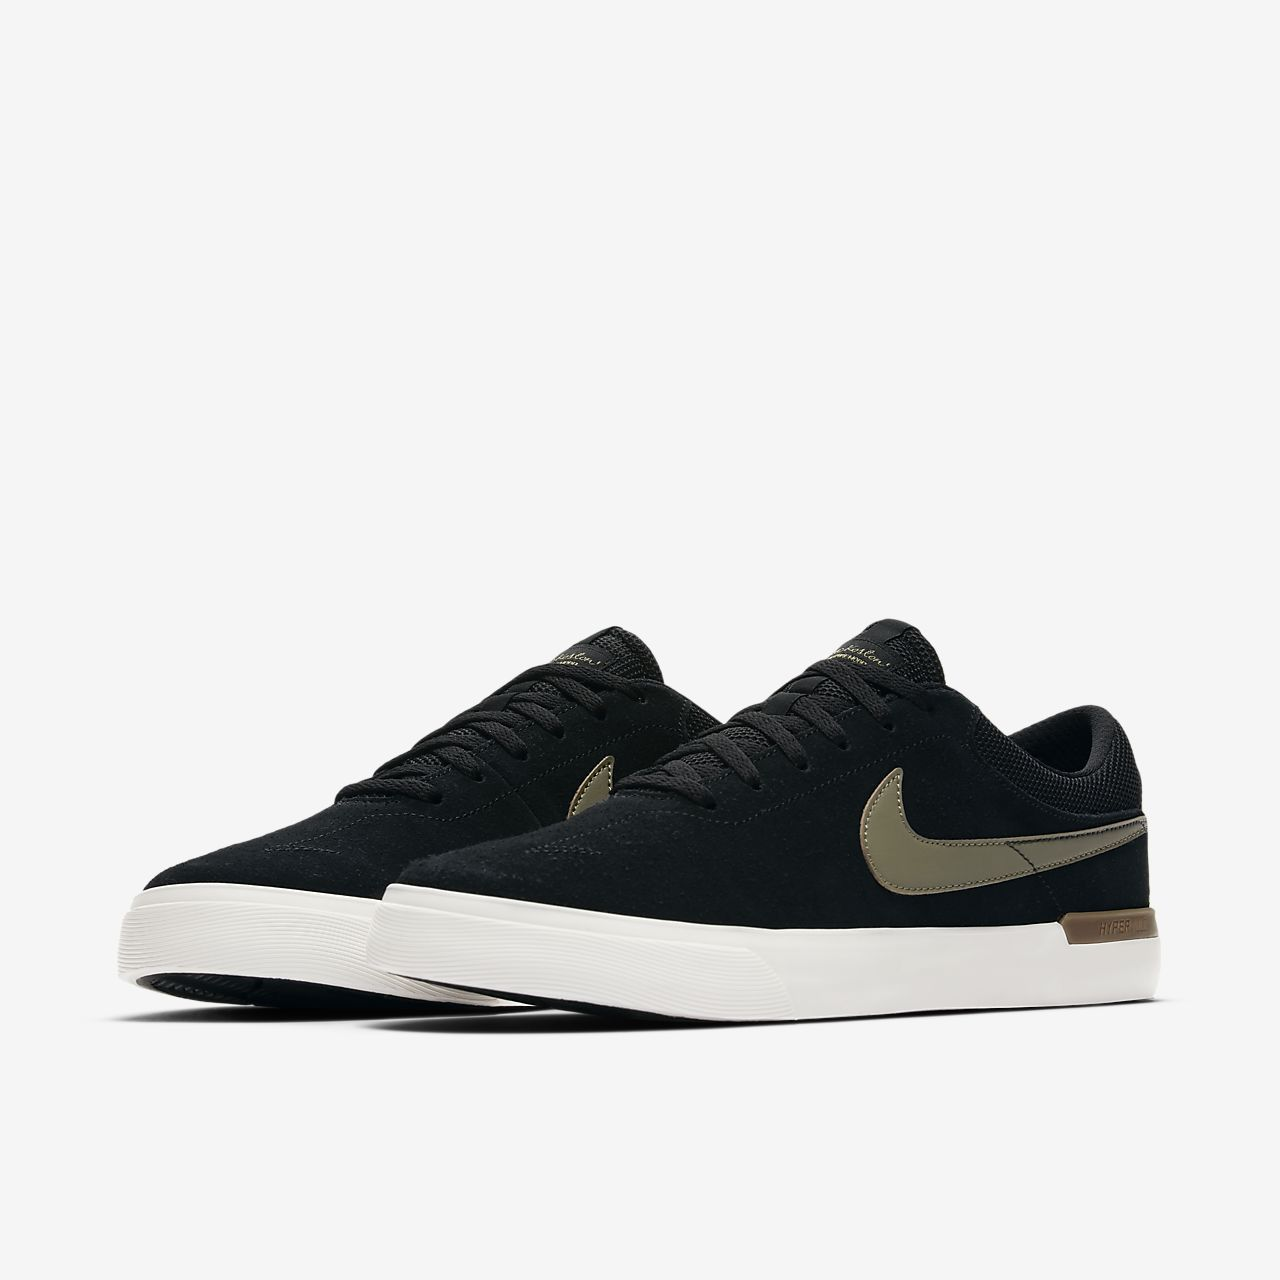 free shipping 5f09d 99699 Nike SB Koston Hypervulc Men s Skateboarding Shoe  skateboardingshoes